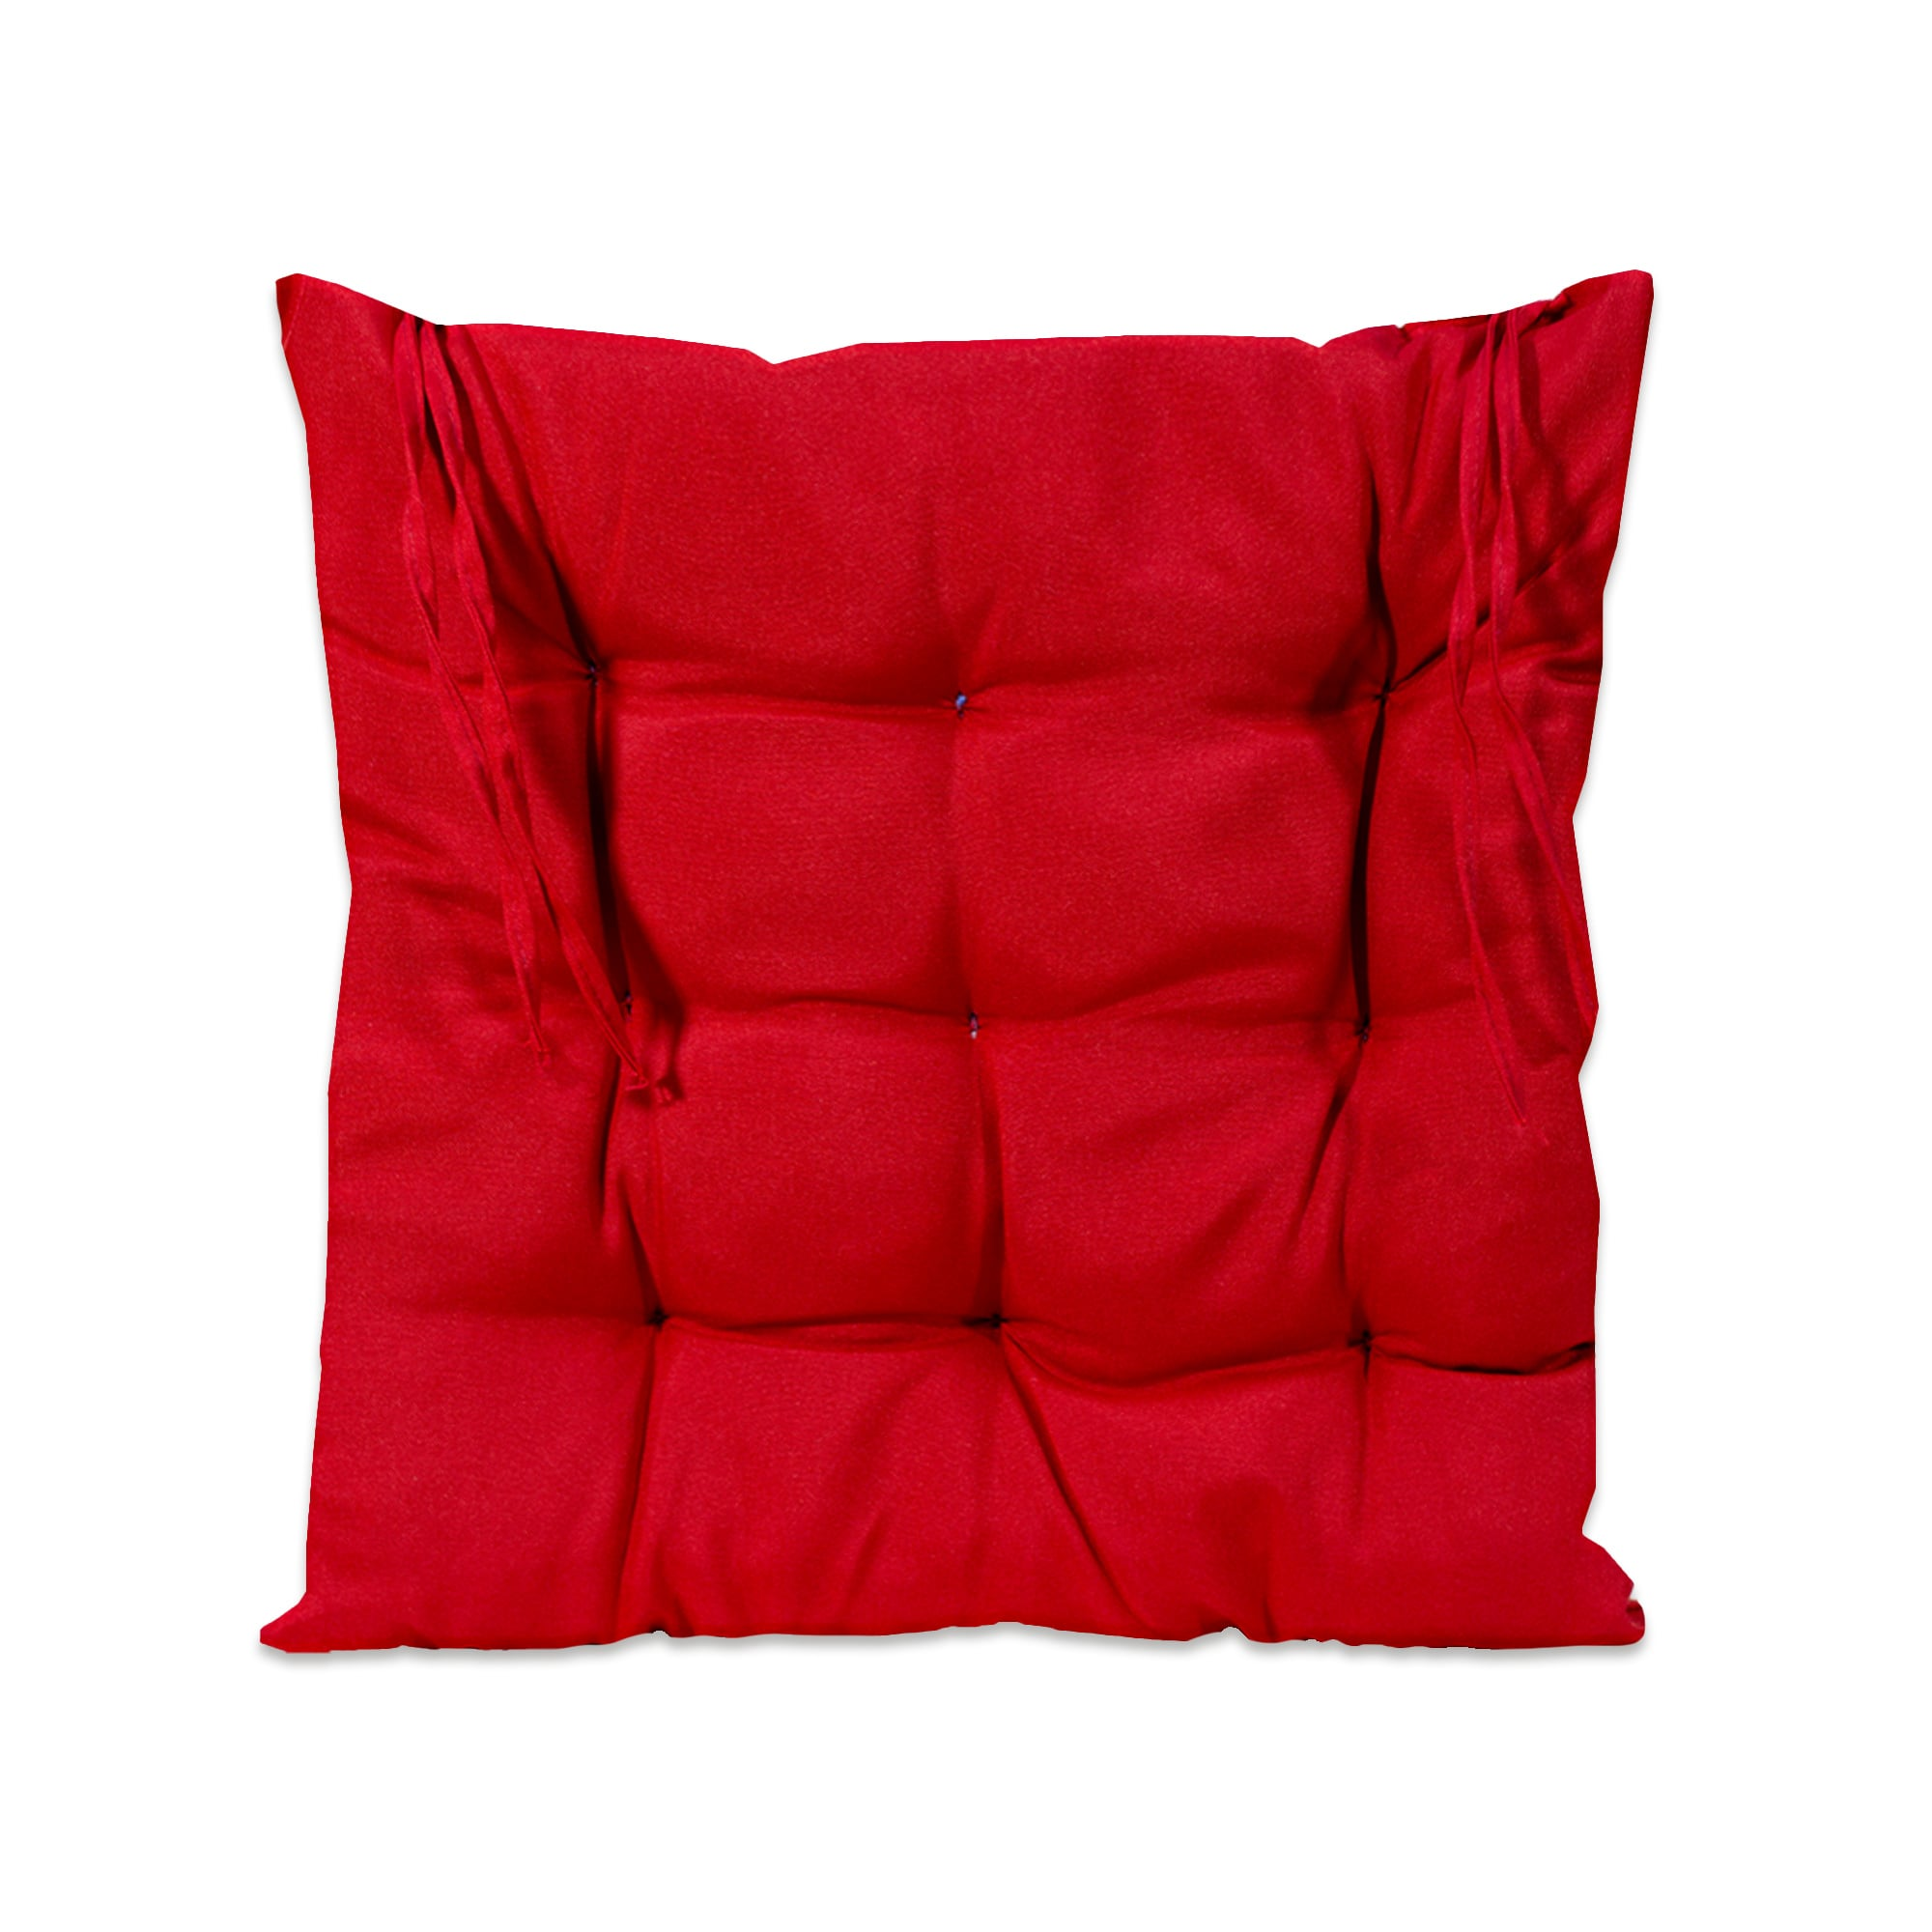 Assento de Cadeira Futton Oxford